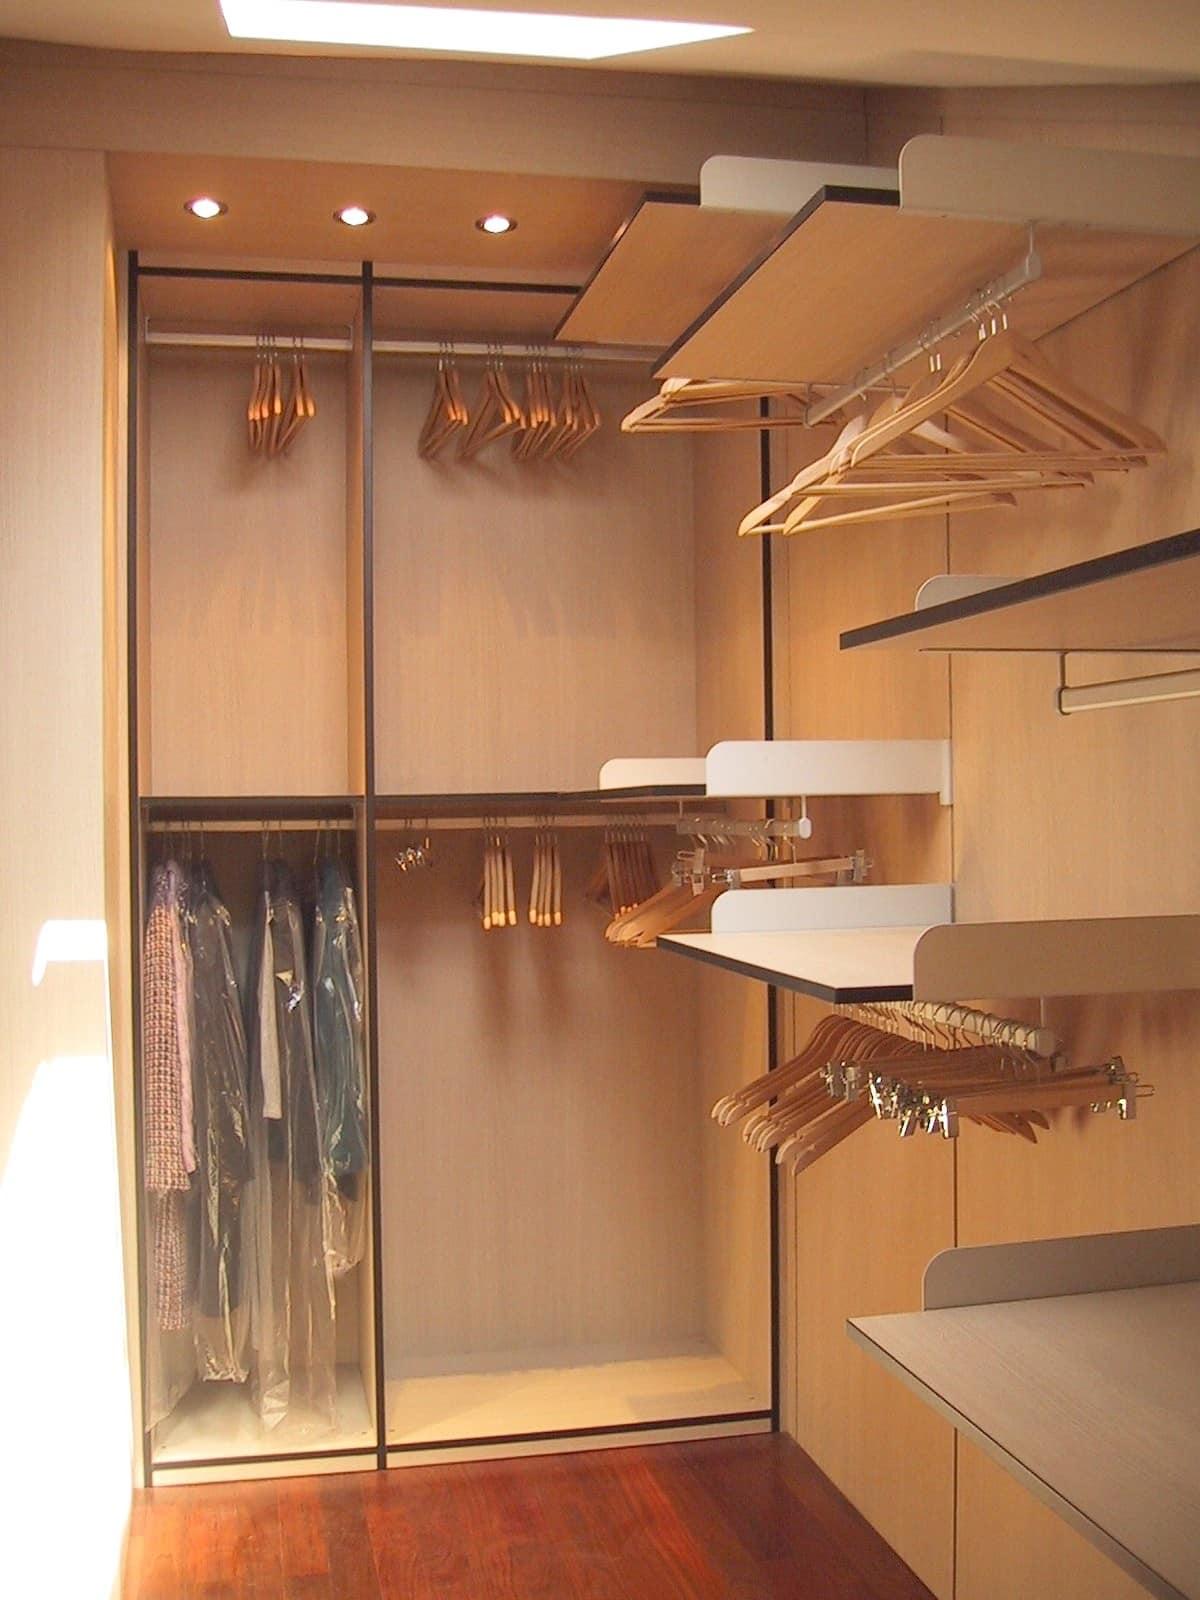 Walk in closet 05, Walk in closet in under-roof room